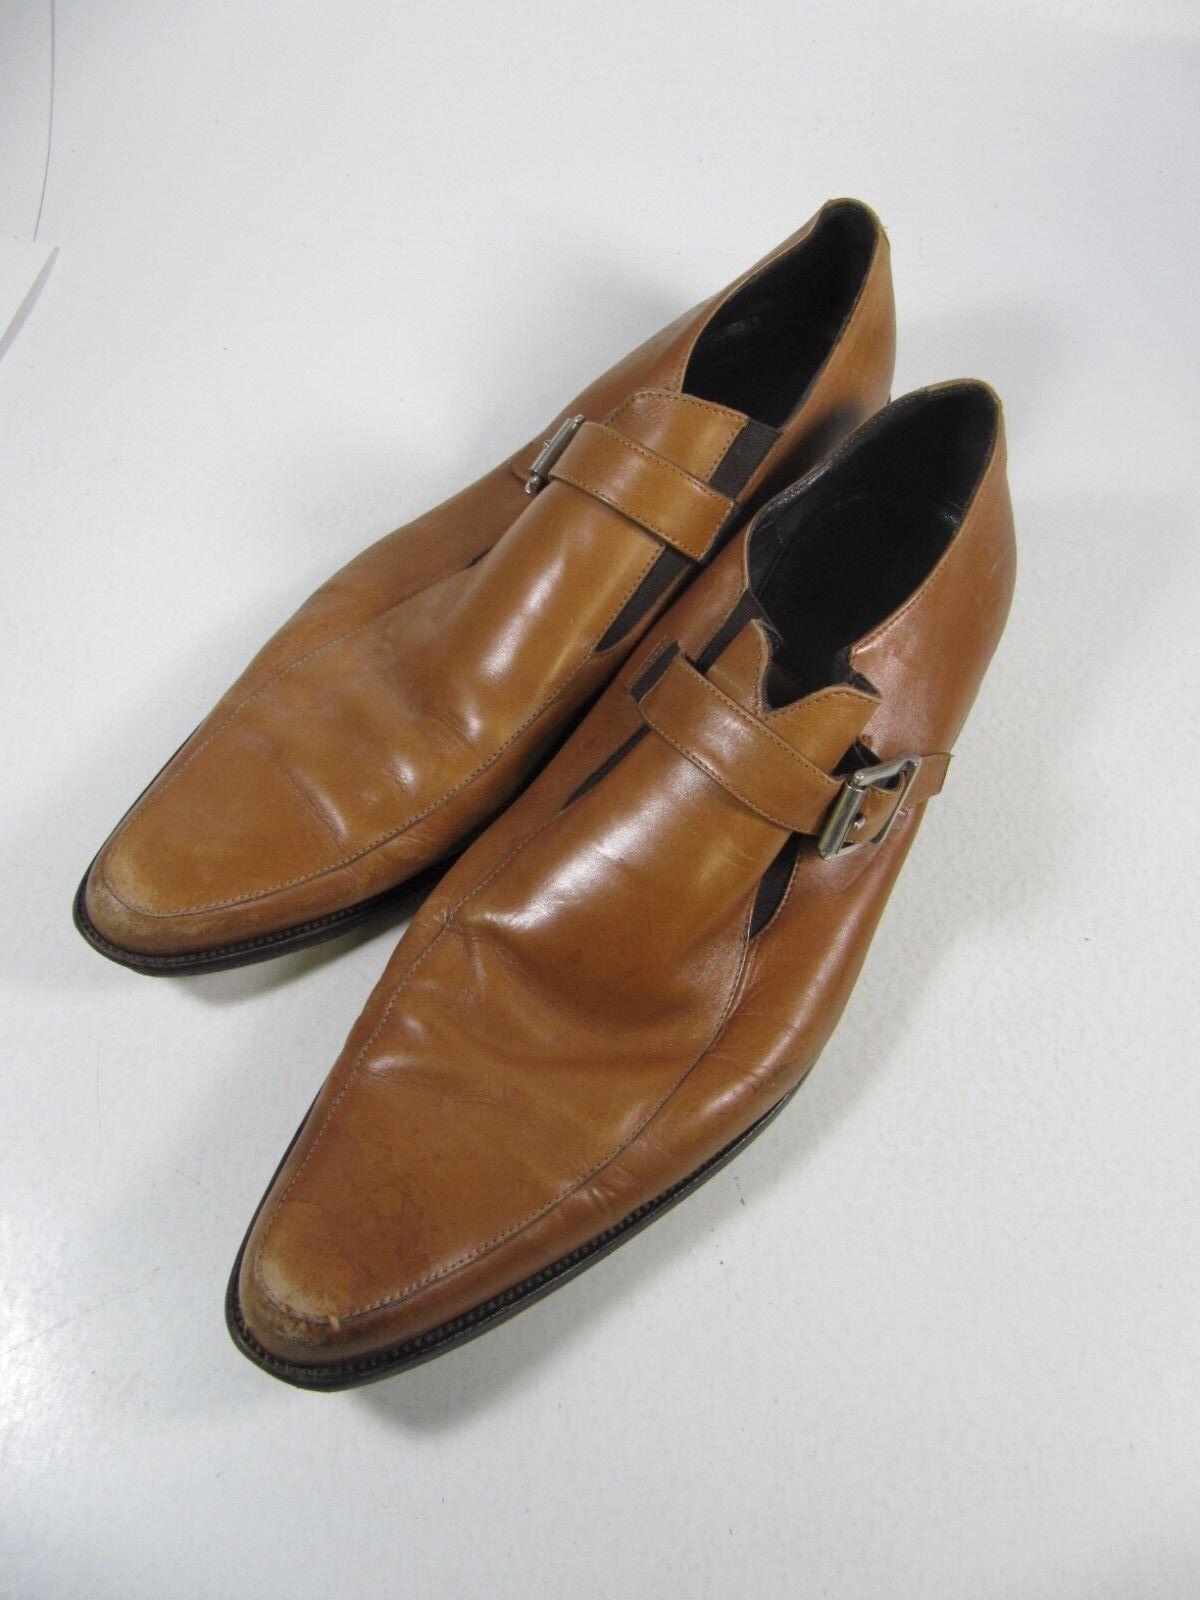 acquistare ora Donald J Pliner Jimmy Marrone Tan Dress Dress Dress Uomo scarpe Buckle Dimensione 13 M I20  n ° 1 online